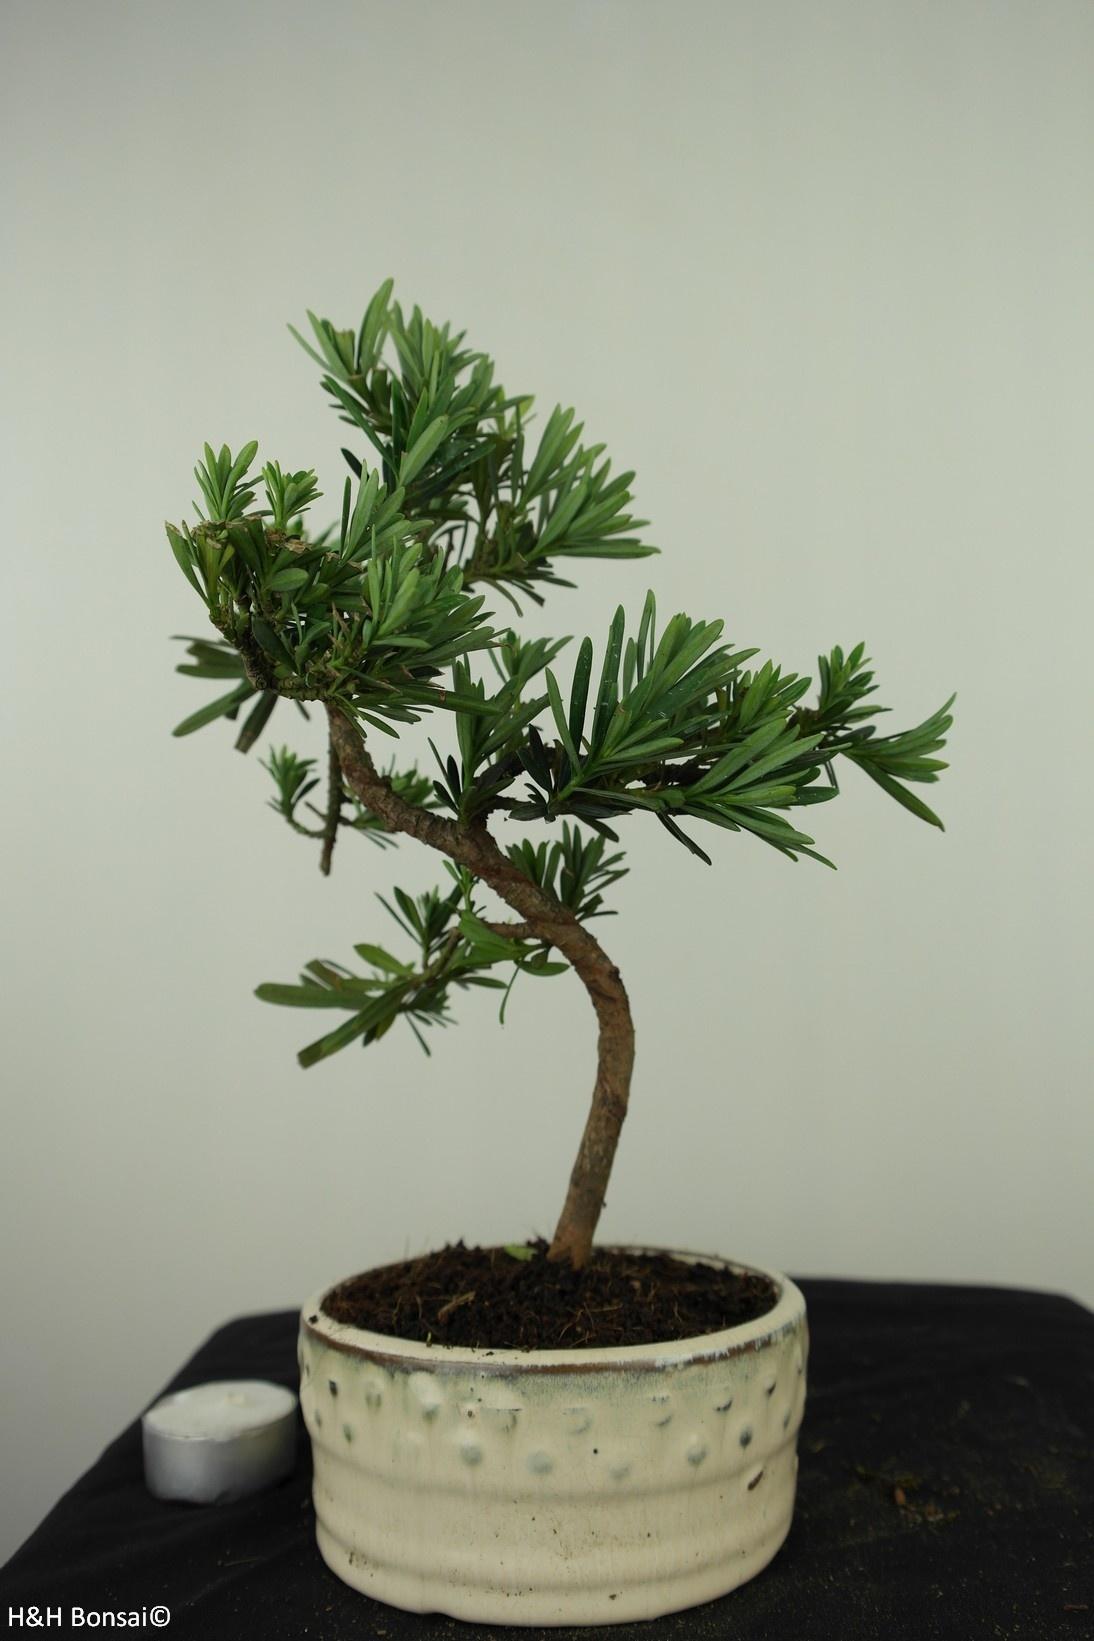 Bonsai Buddhist Pine, Podocarpus, no. 7561